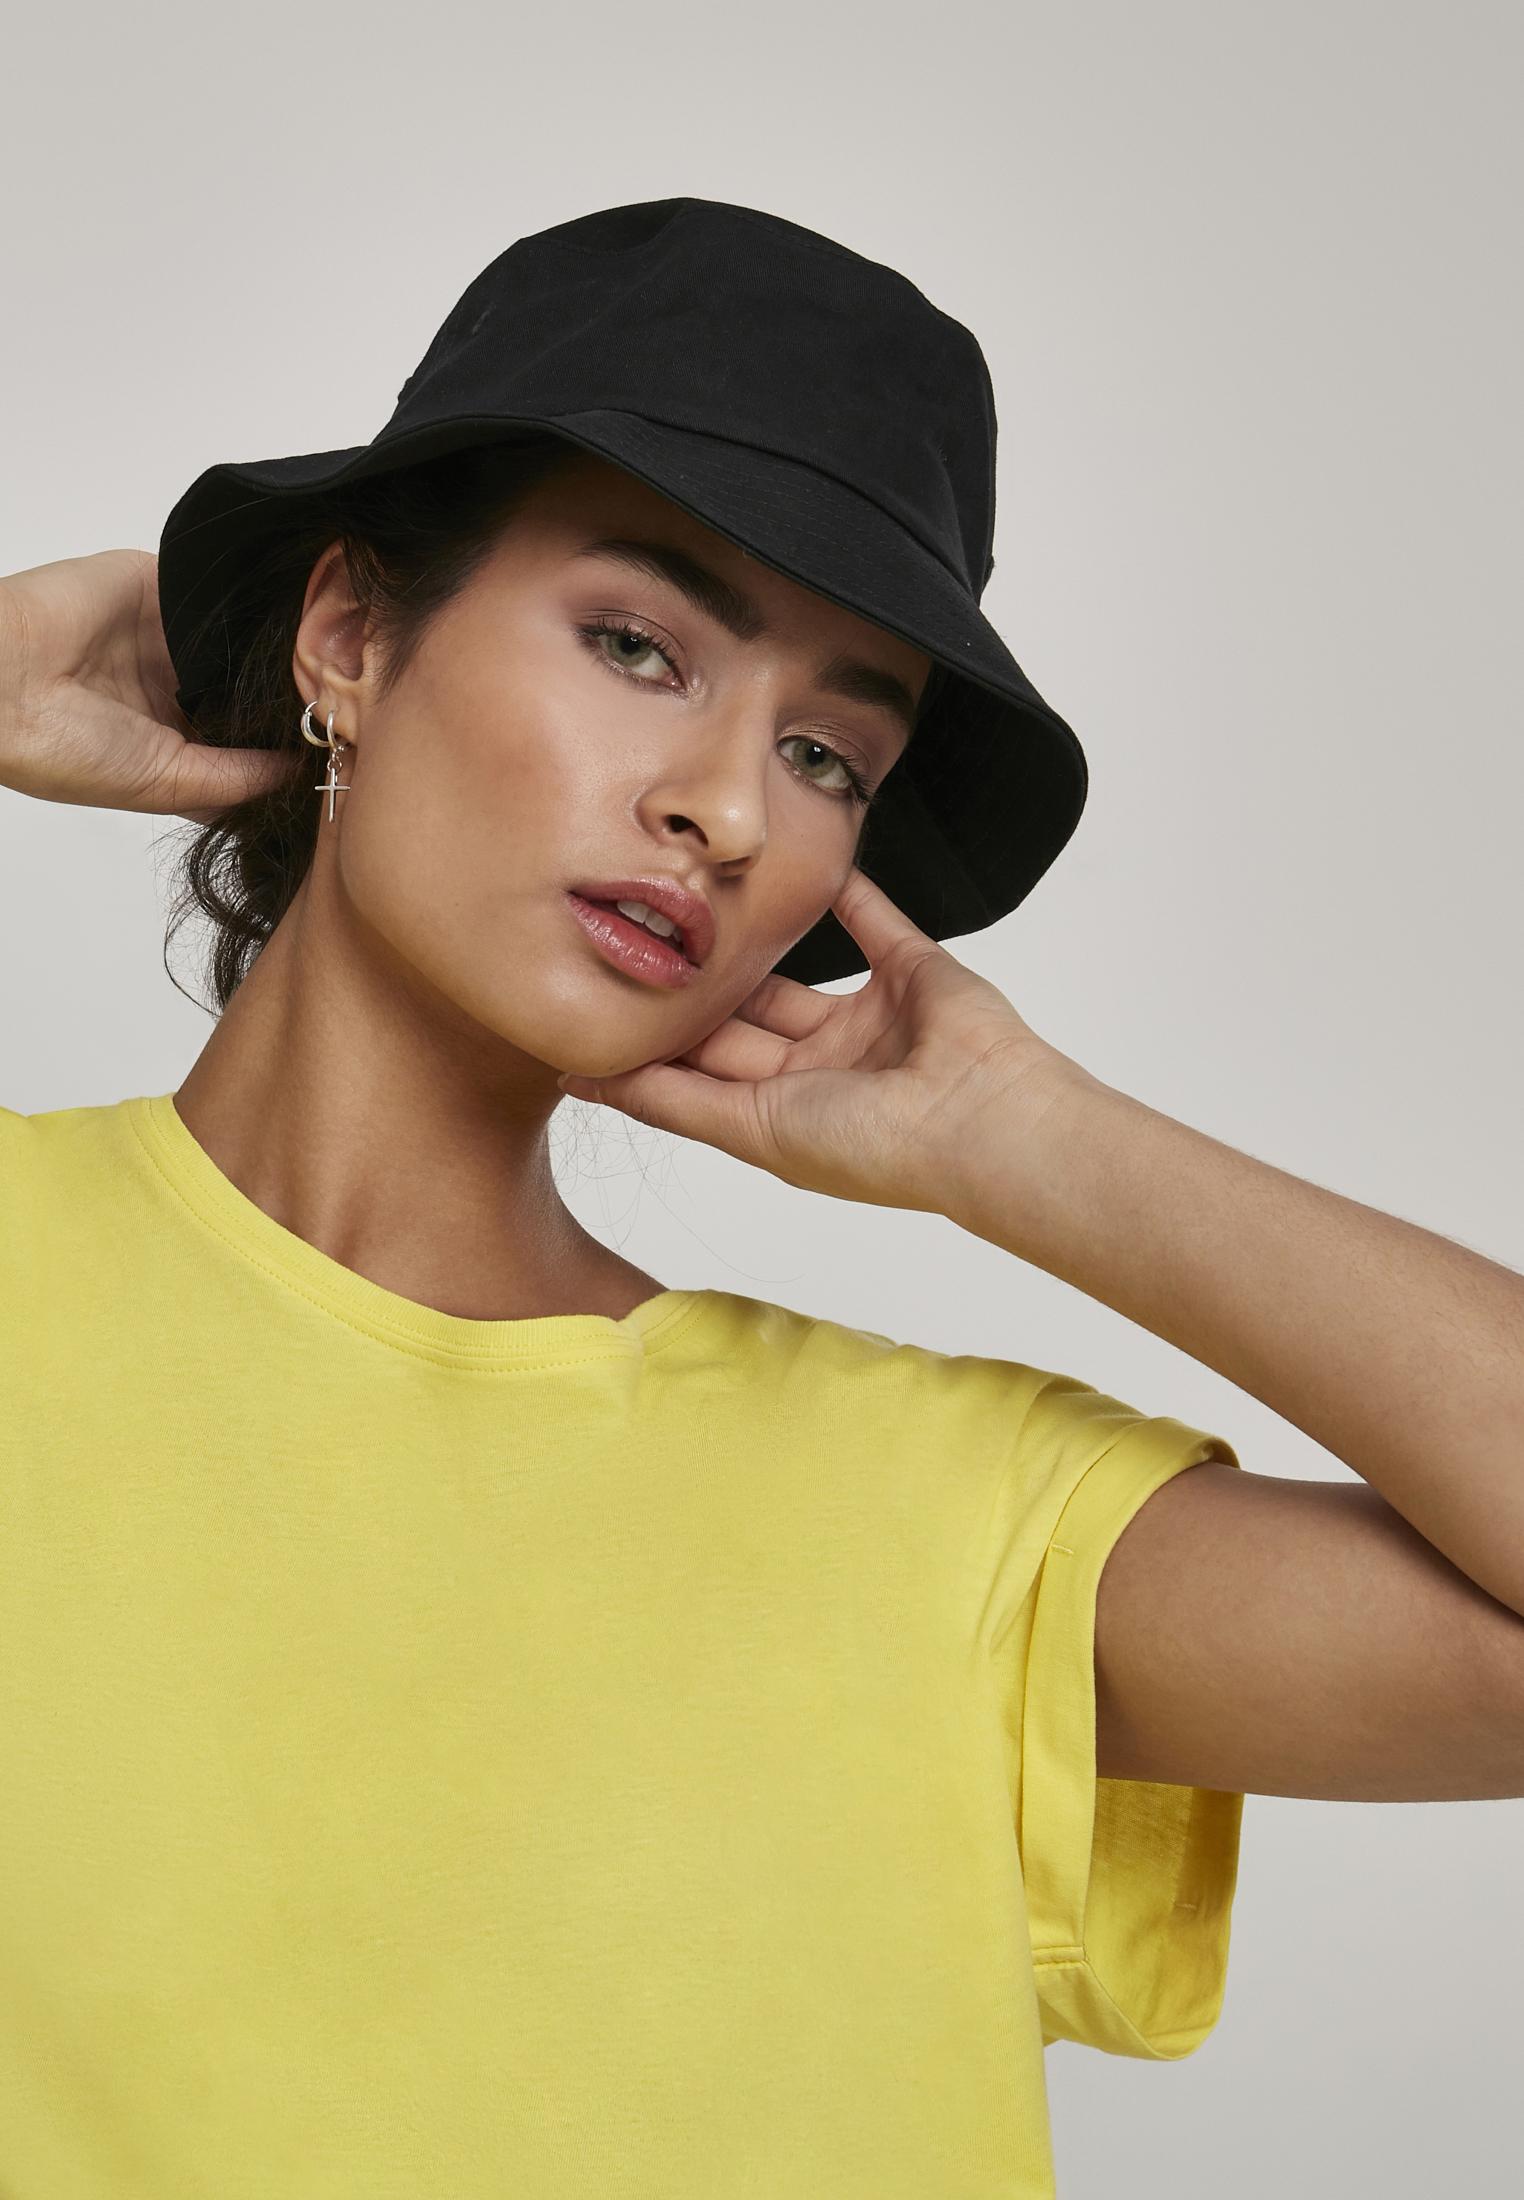 bdb1095ddbe Flexfit Cotton Twill Bucket Hat Flexfit Cotton Twill Bucket Hat ...